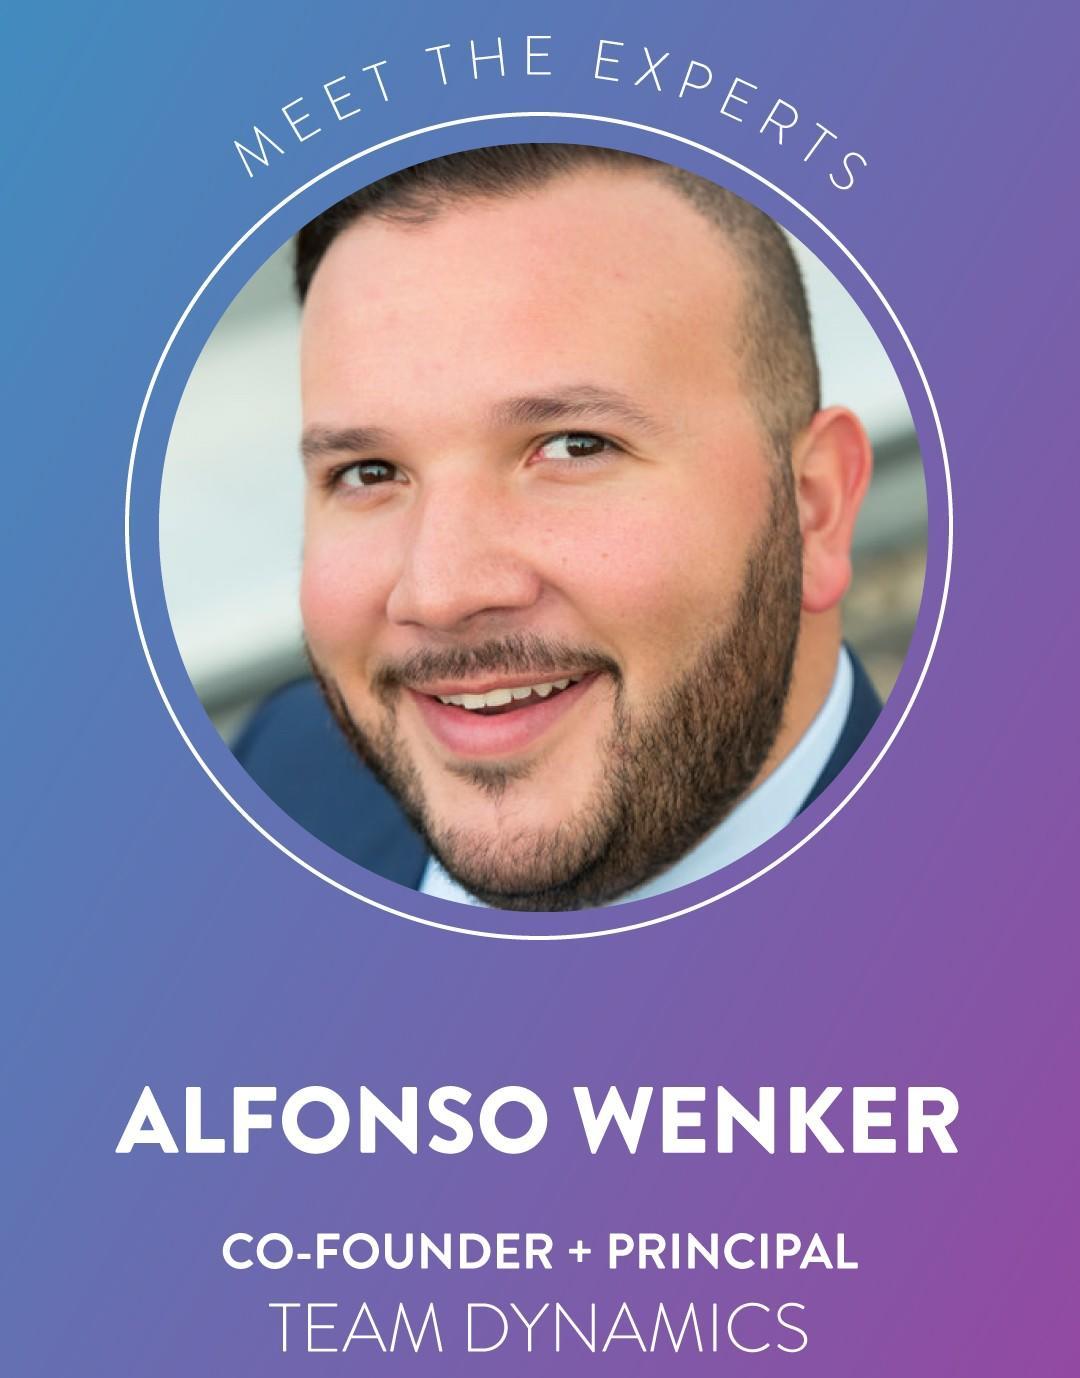 Alfonso Wenker, cofounder and principal Team Dynamics LLC